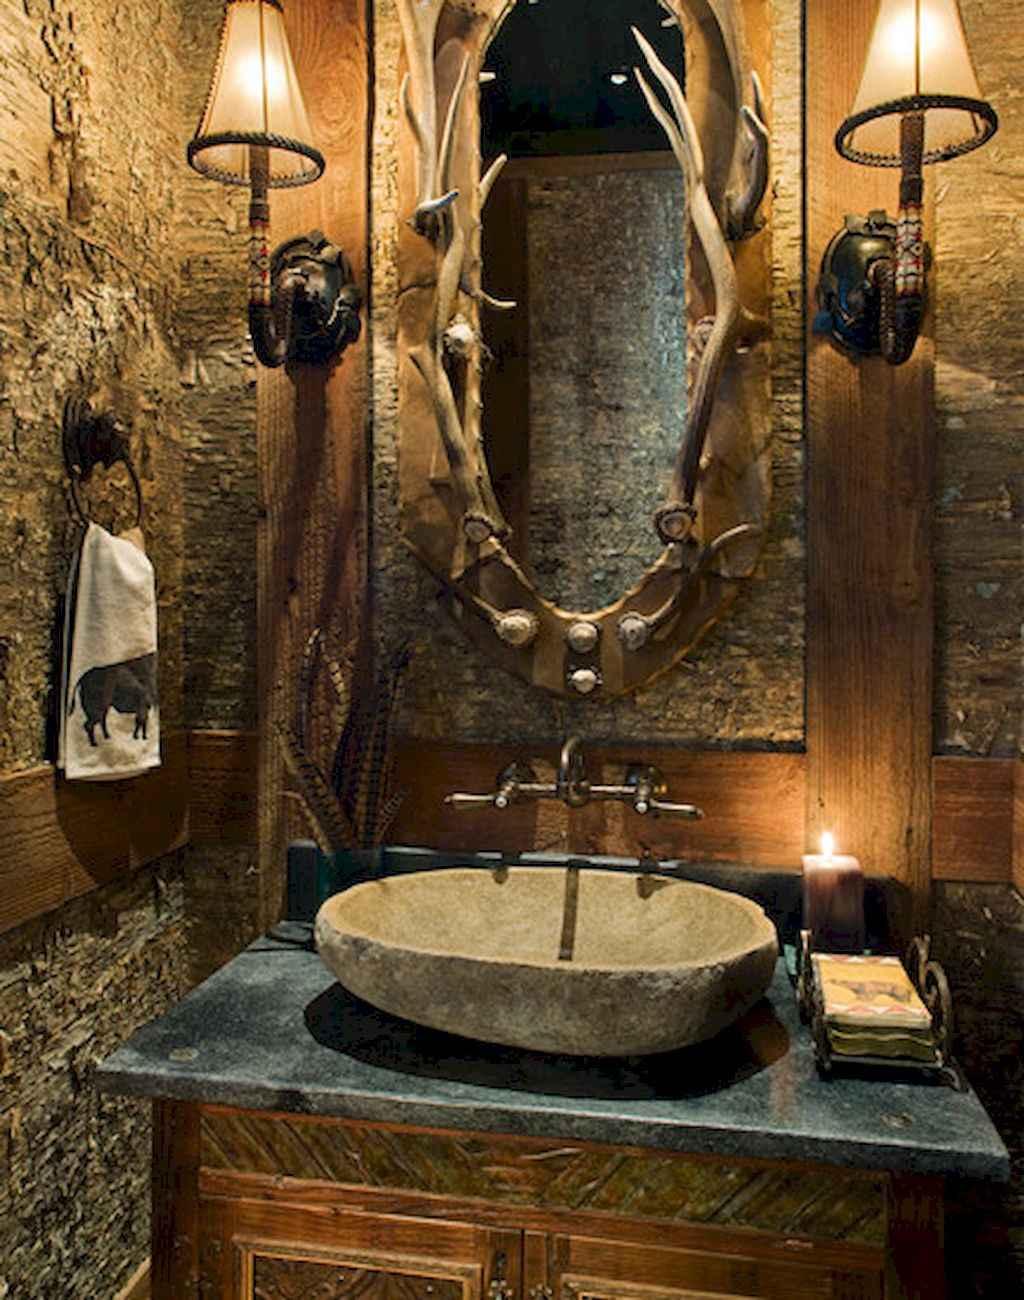 Inspiring rustic bathroom decor ideas (33)